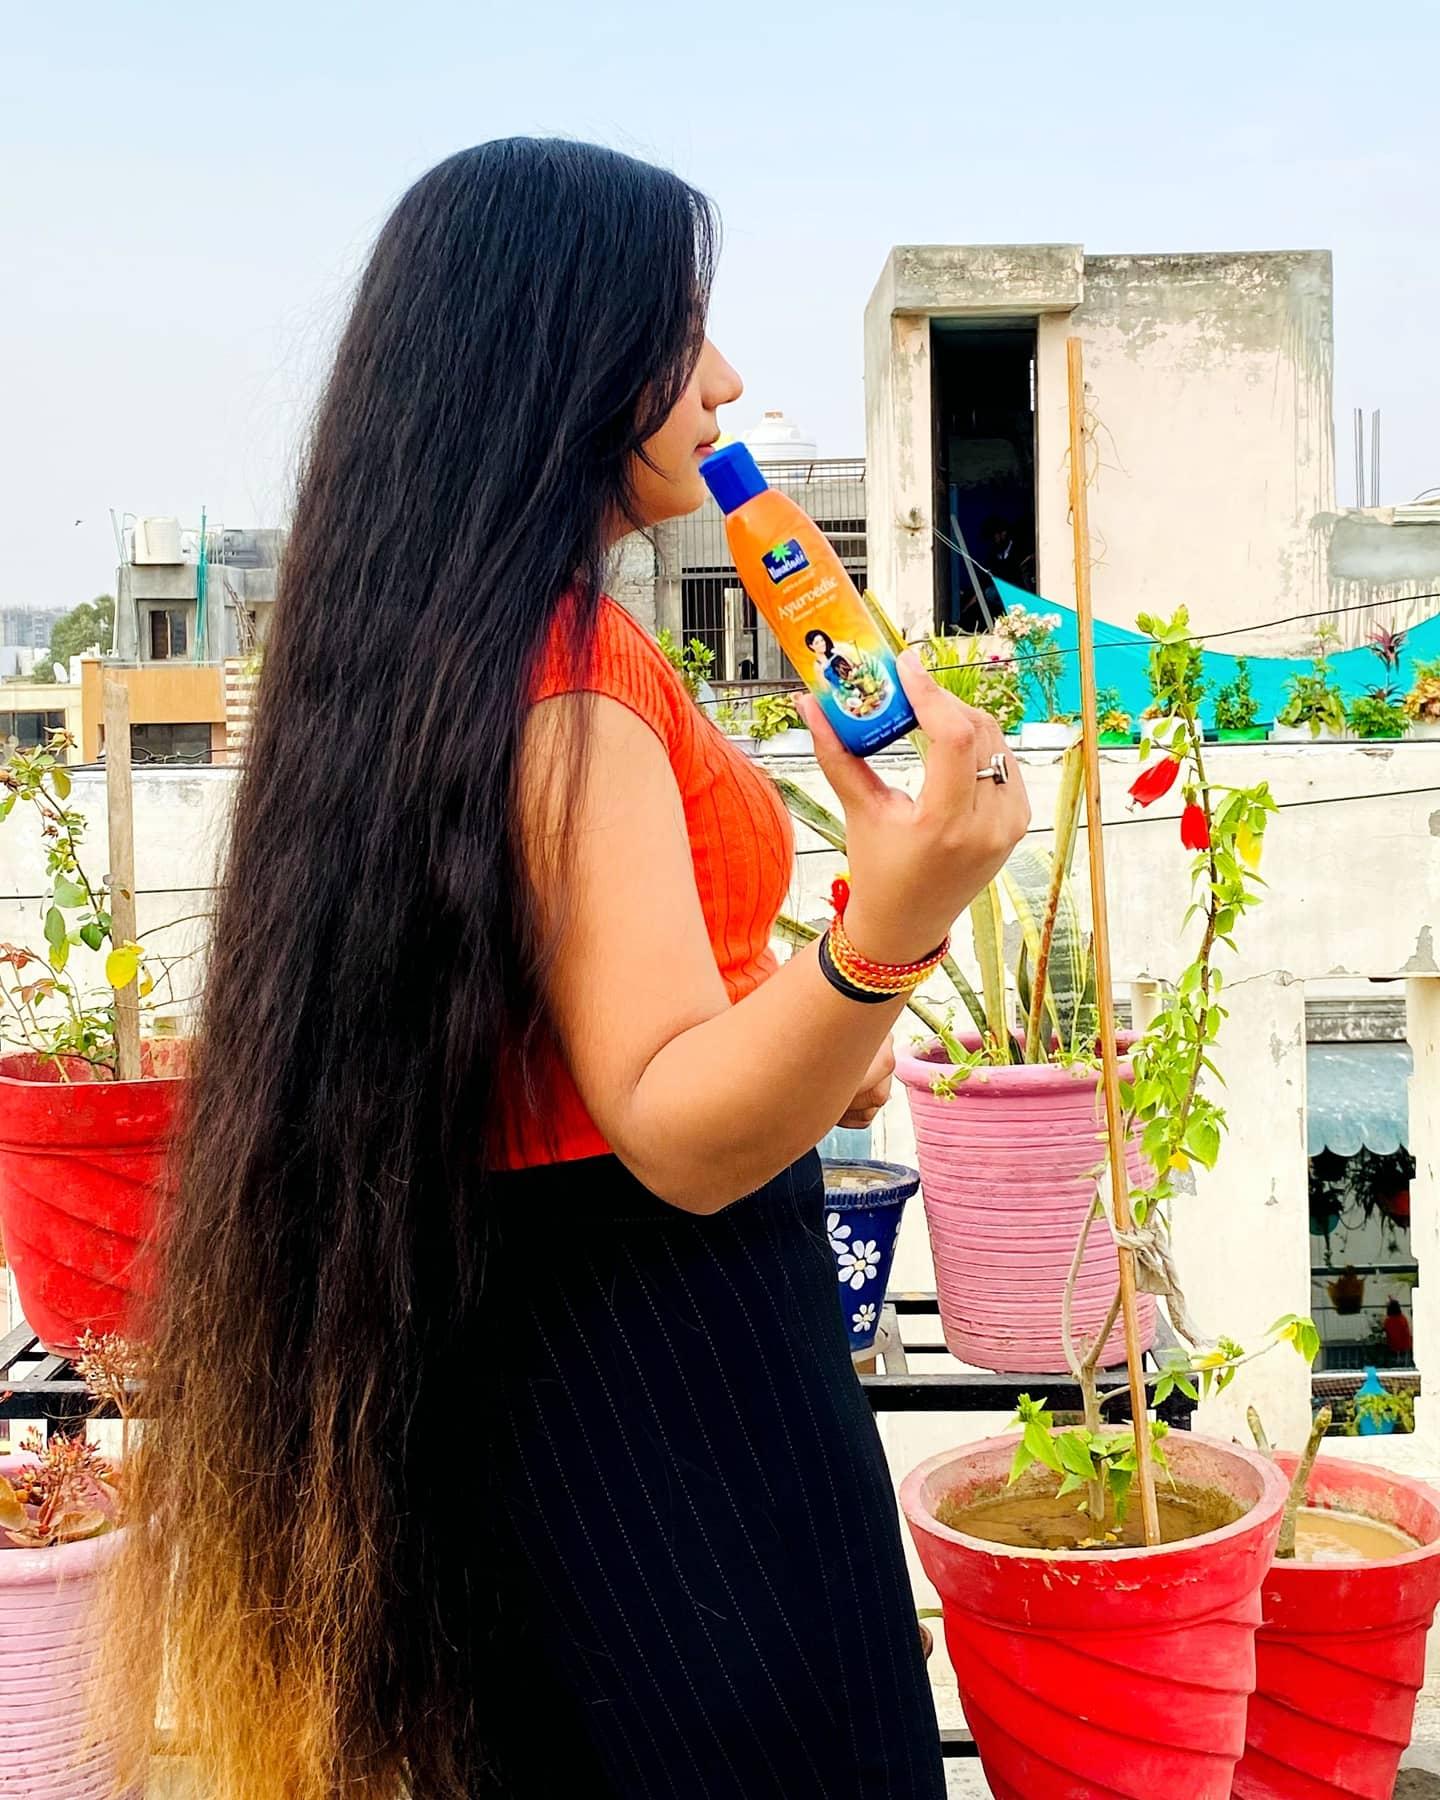 Parachute Advansed Ayurvedic Coconut Hair Oil pic 2-Amazing hair oil-By deeksha_yadav